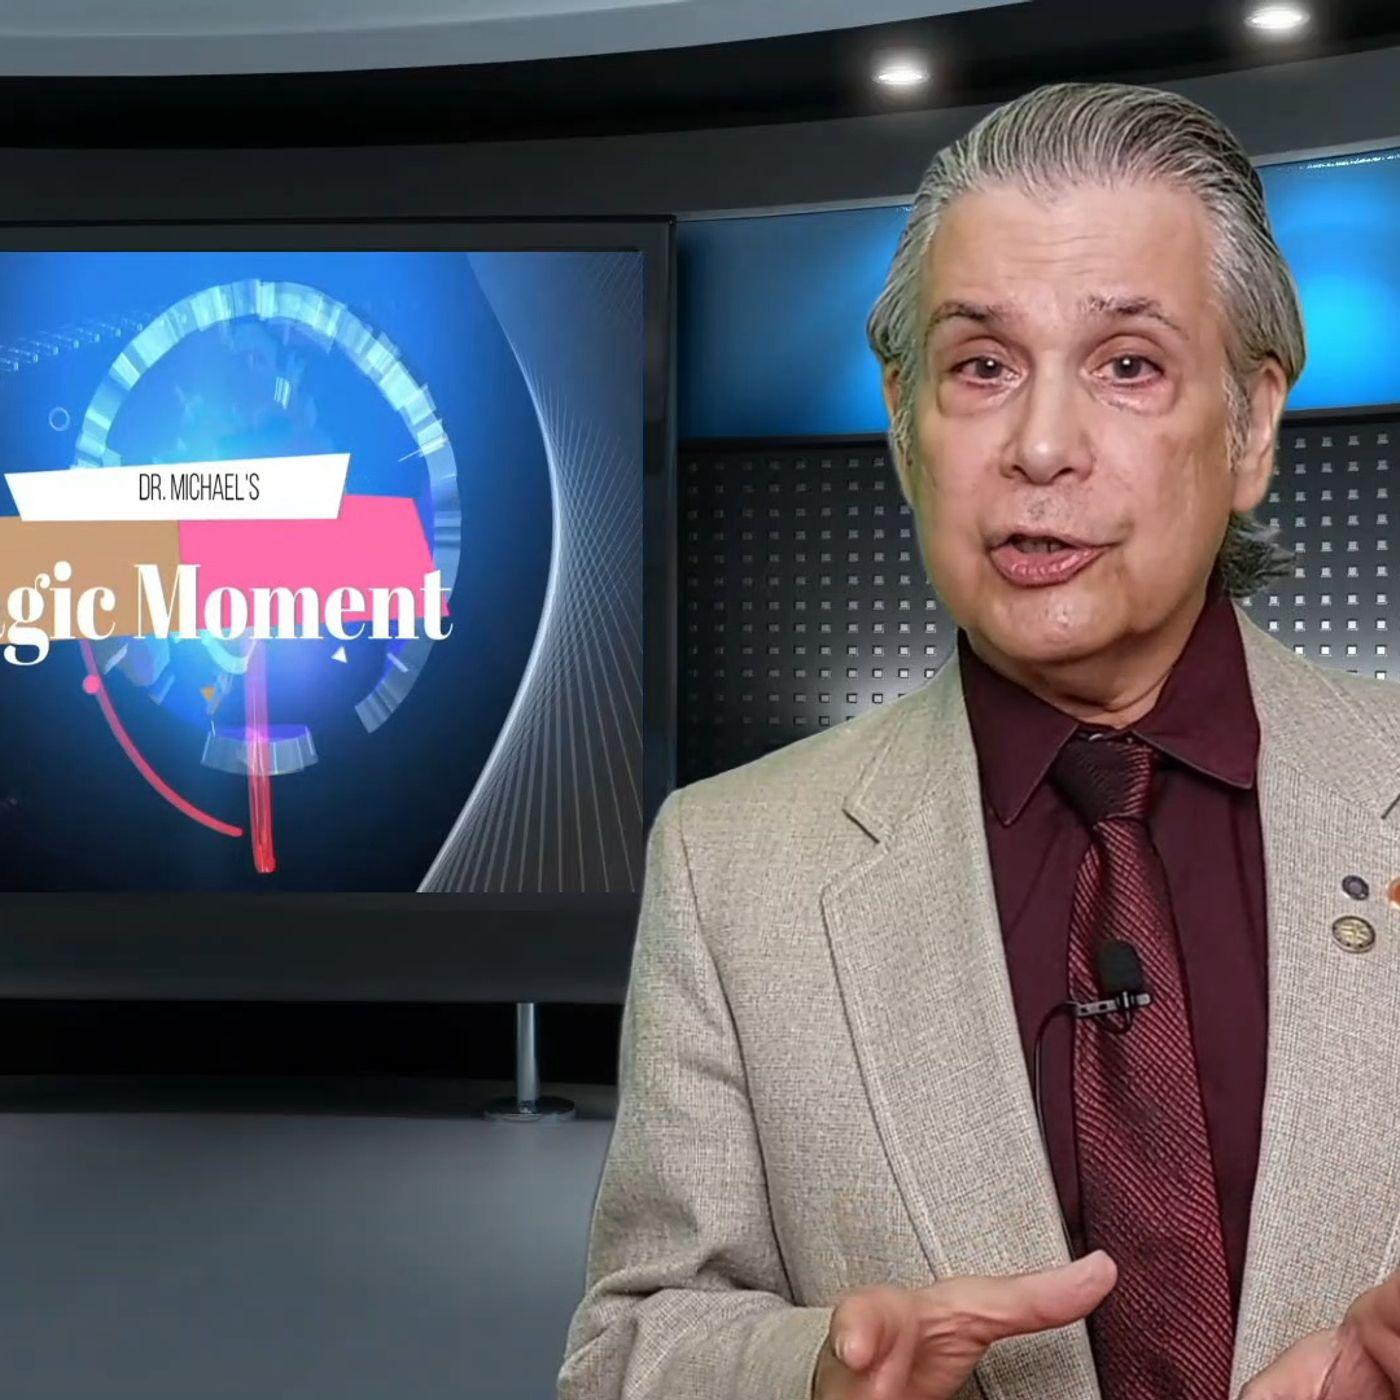 Dr. Michael's One-Minute Magic Moment-SOCIAL MEDIA